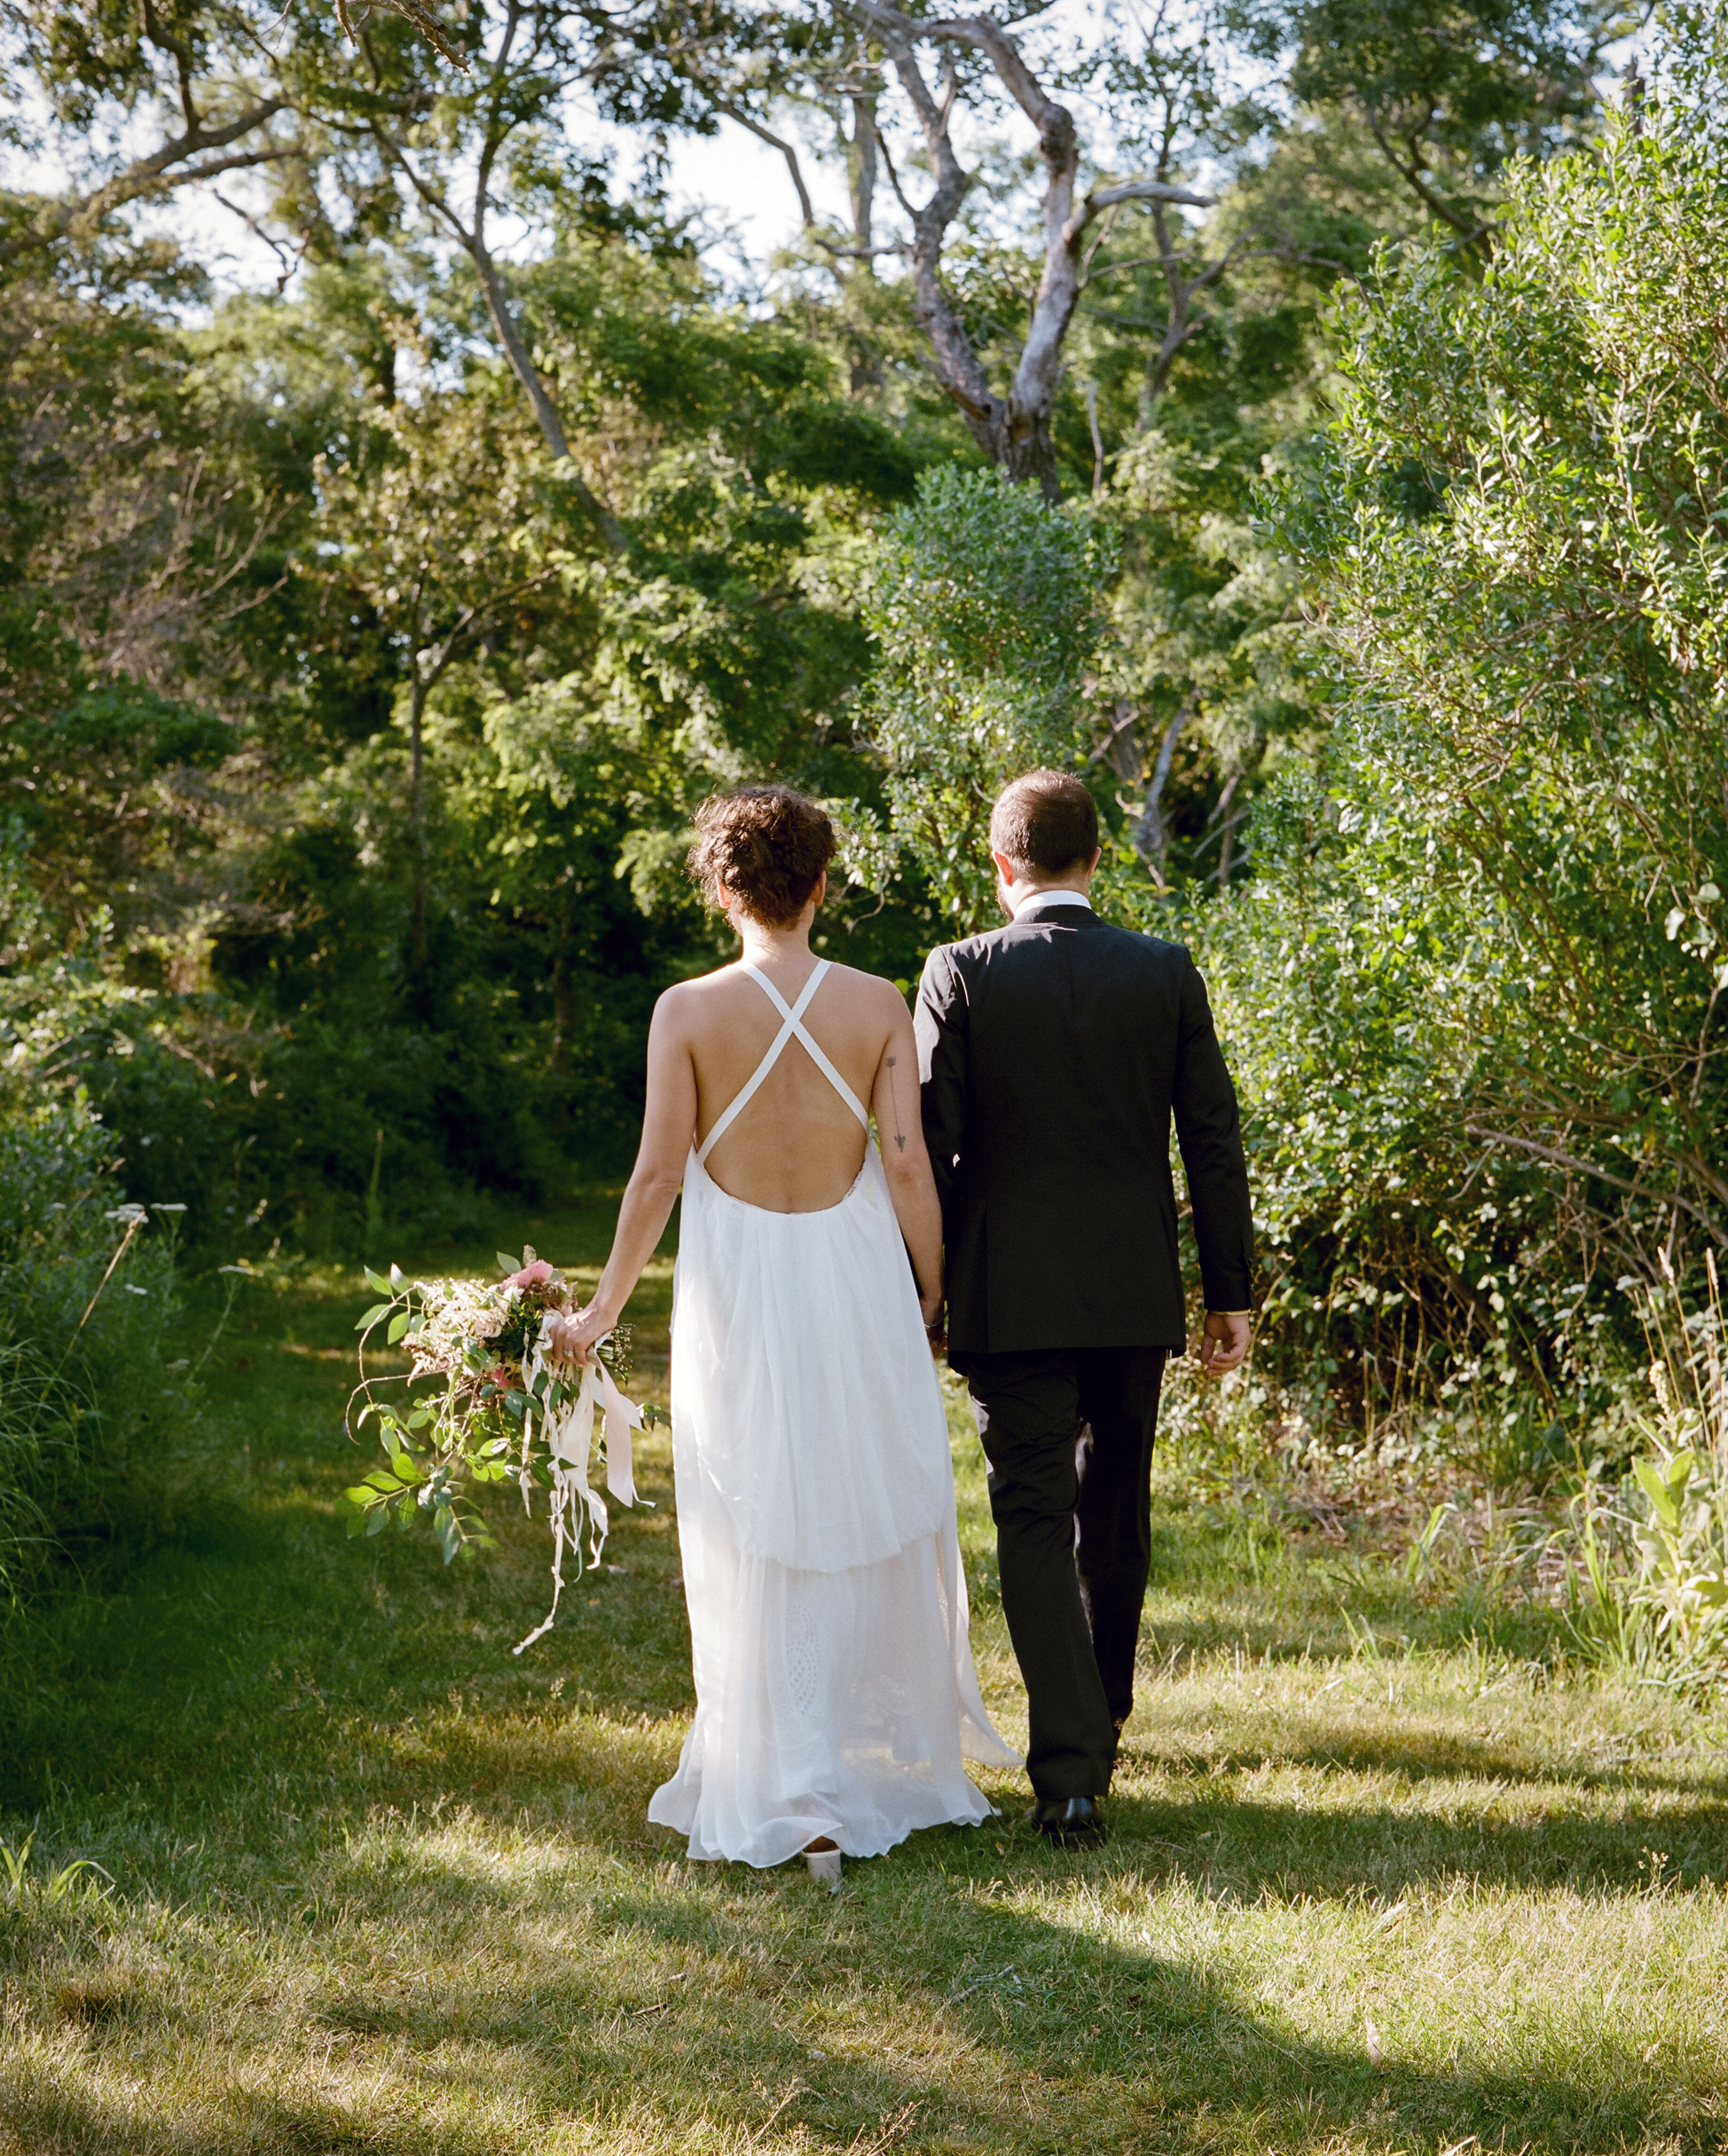 rachel-andrew-wedding-couple-129-s112195-0915.jpg